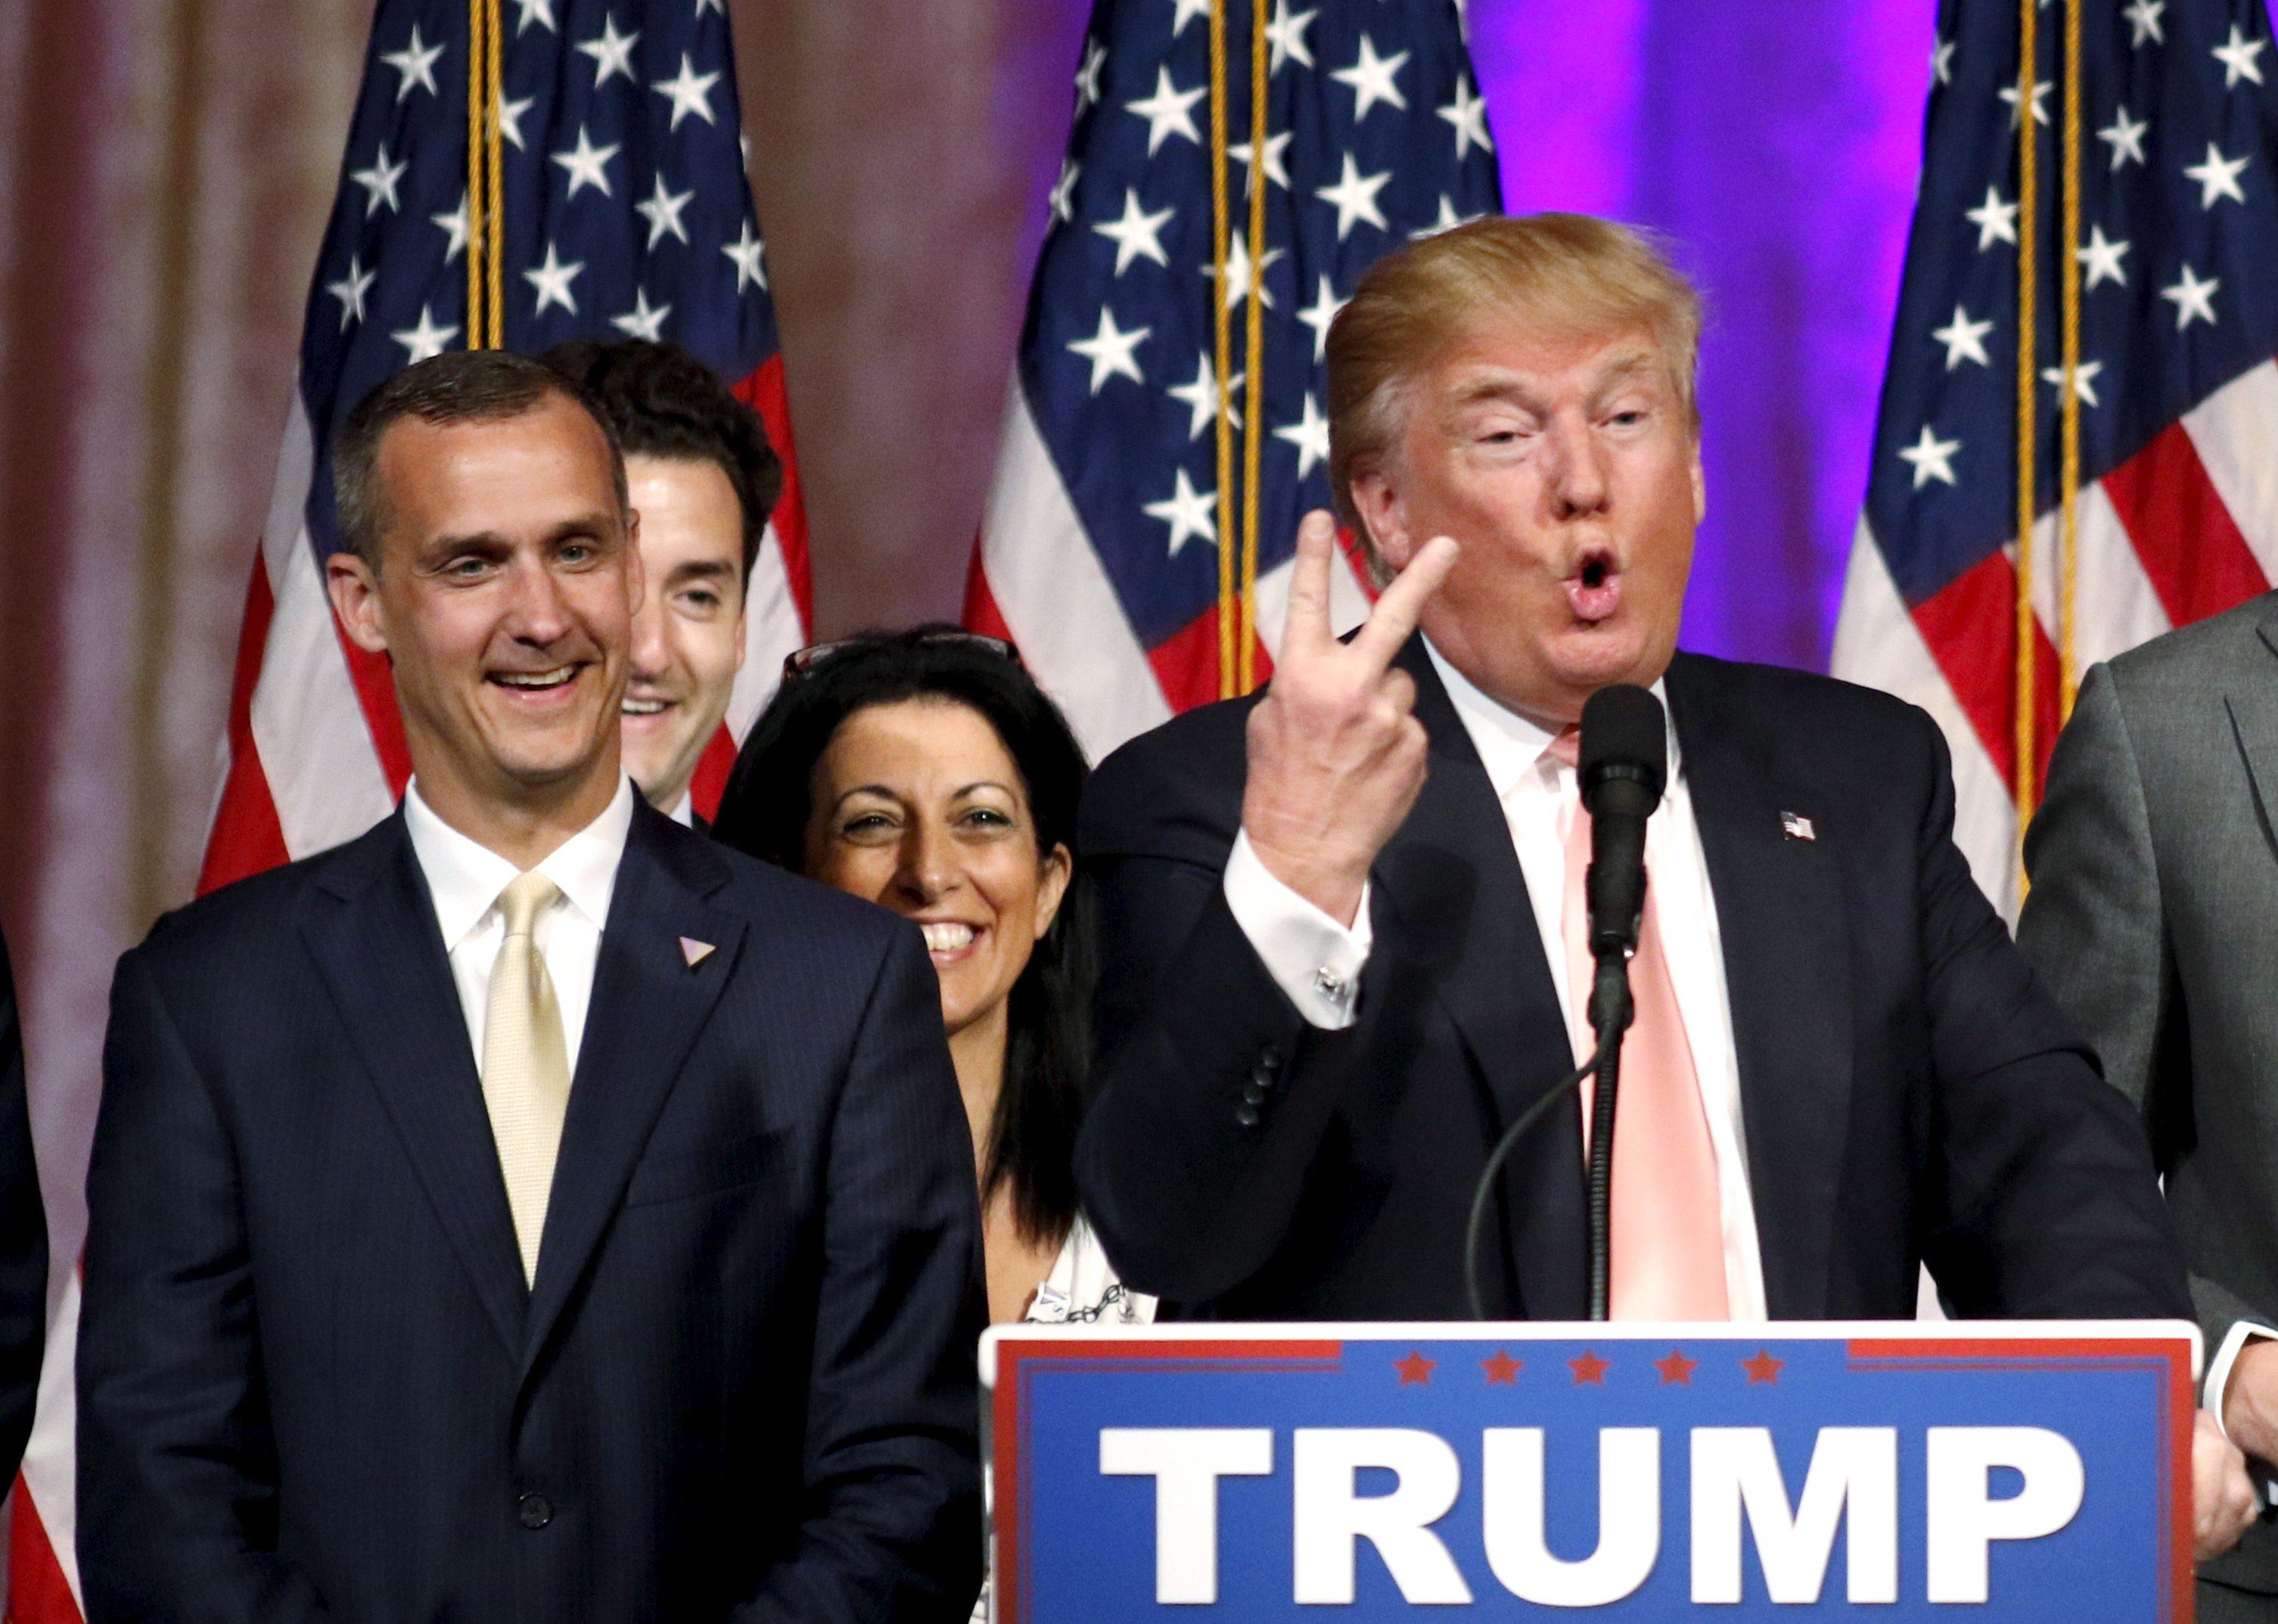 Trump fires campaign manager Lewandowski, taps Manafort as successor